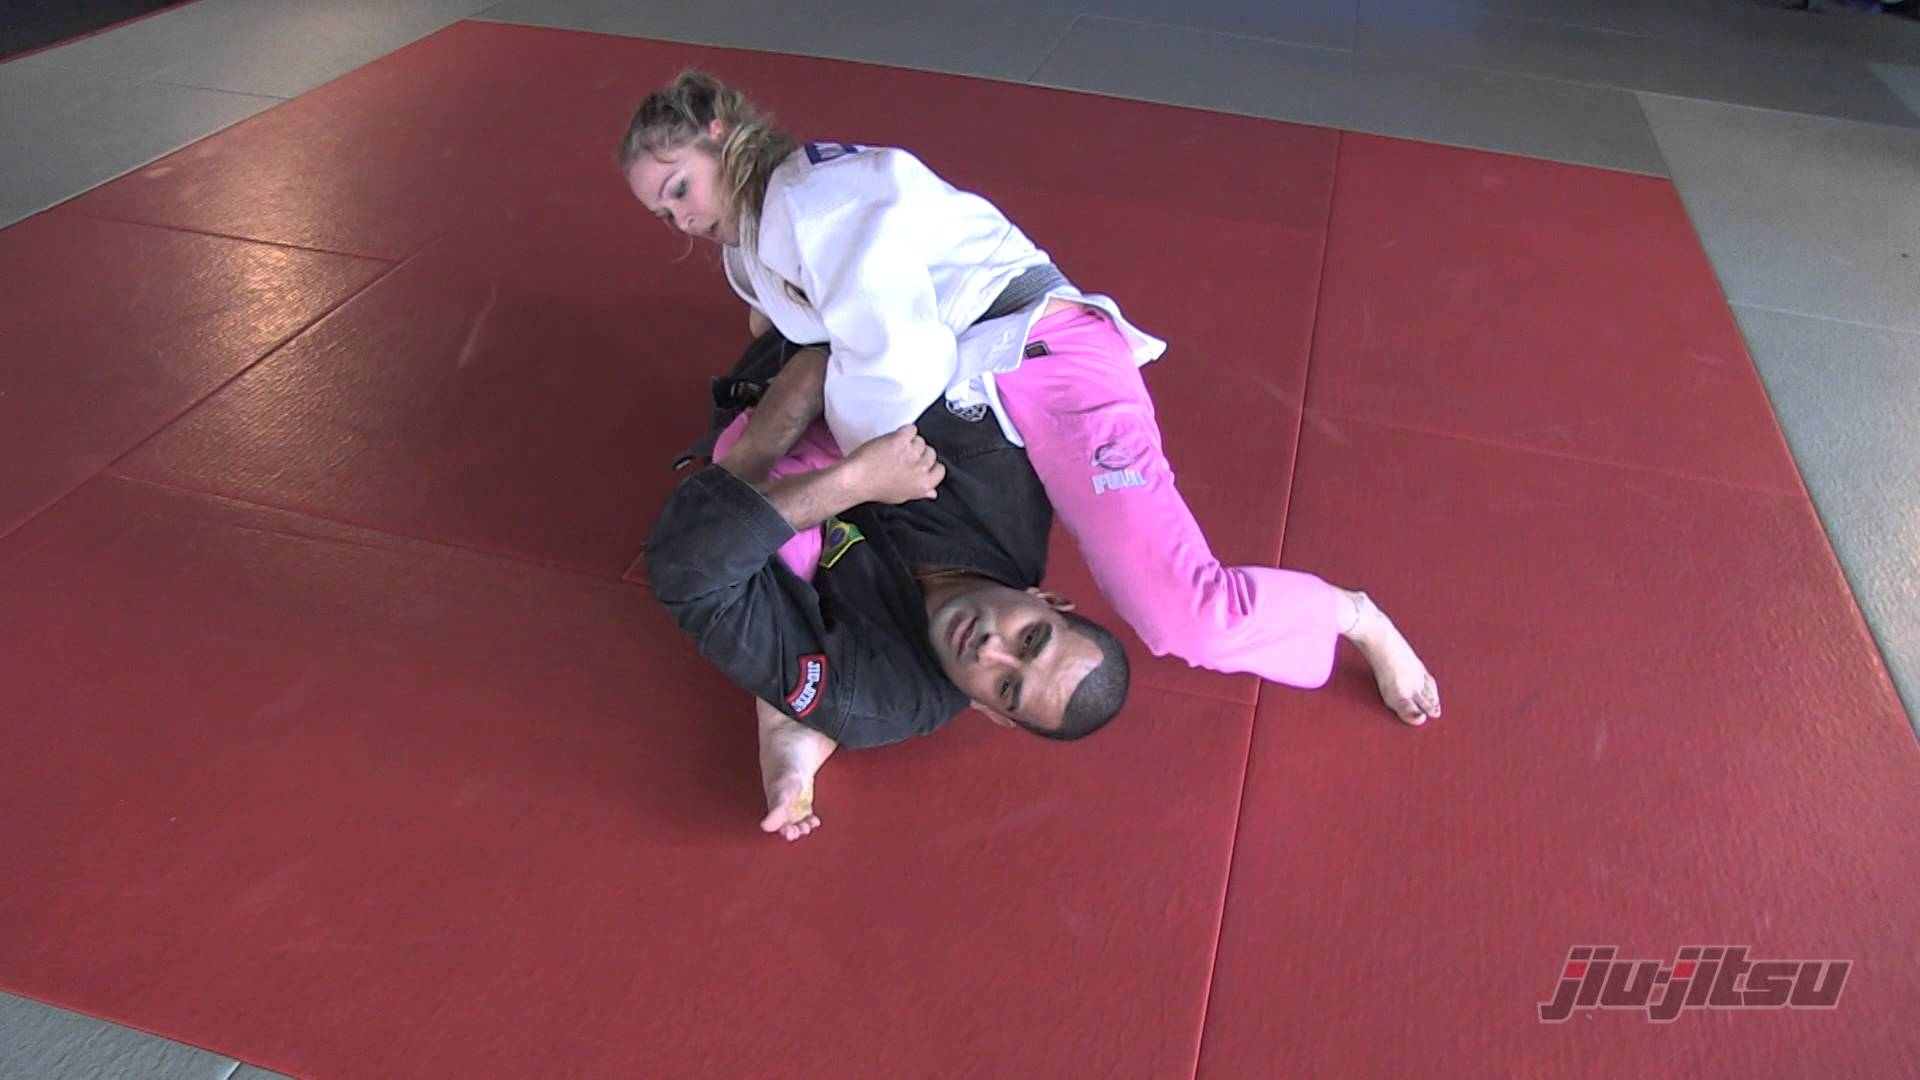 Ronda Rousey – Grip Break to Arm Bar